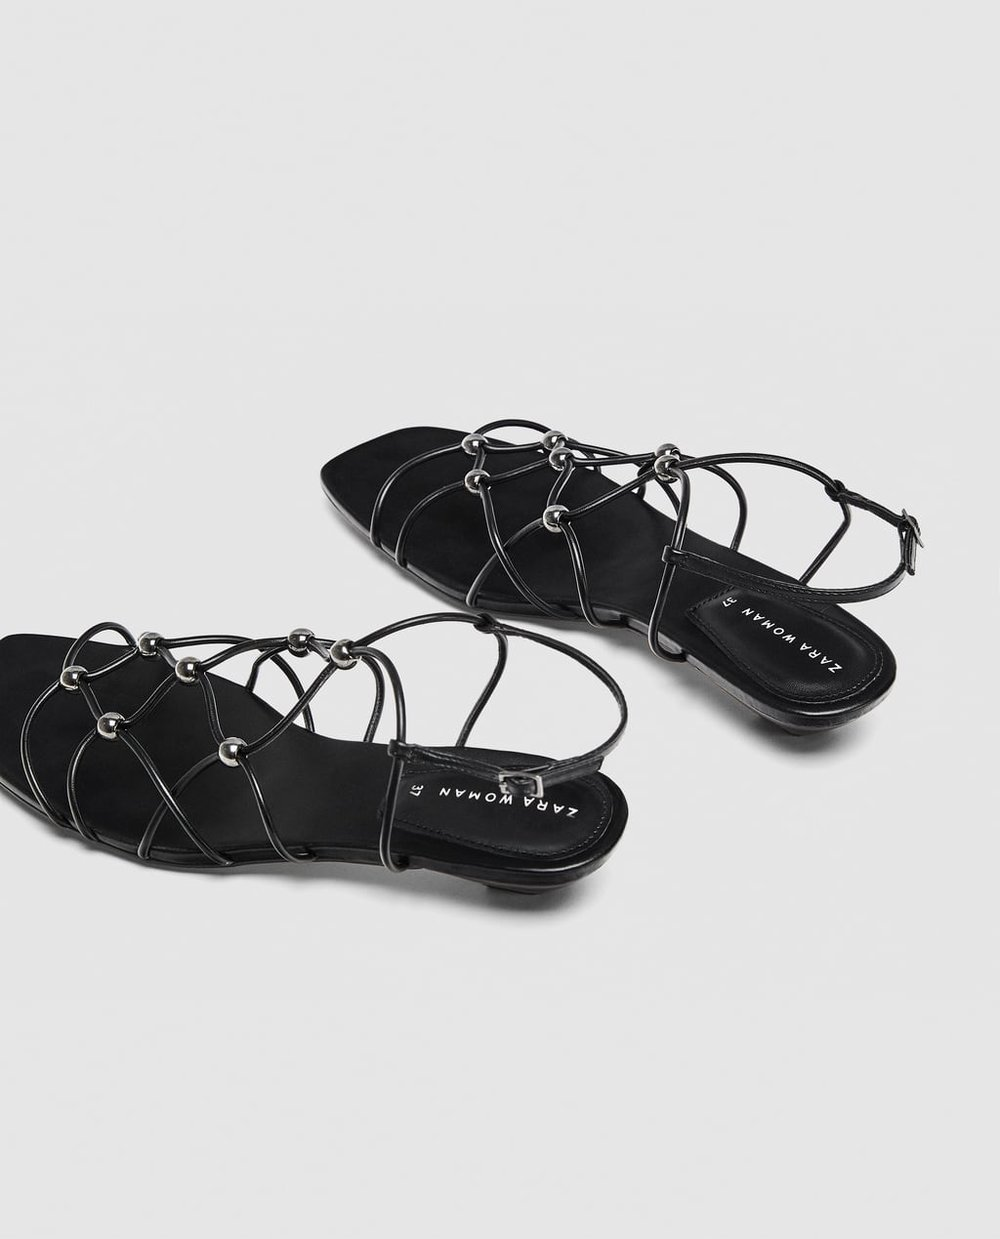 https://www.zara.com/ca/en/strappy-sandals-with-metallic-details-p15605301.html?v1=6693506&v2=969020